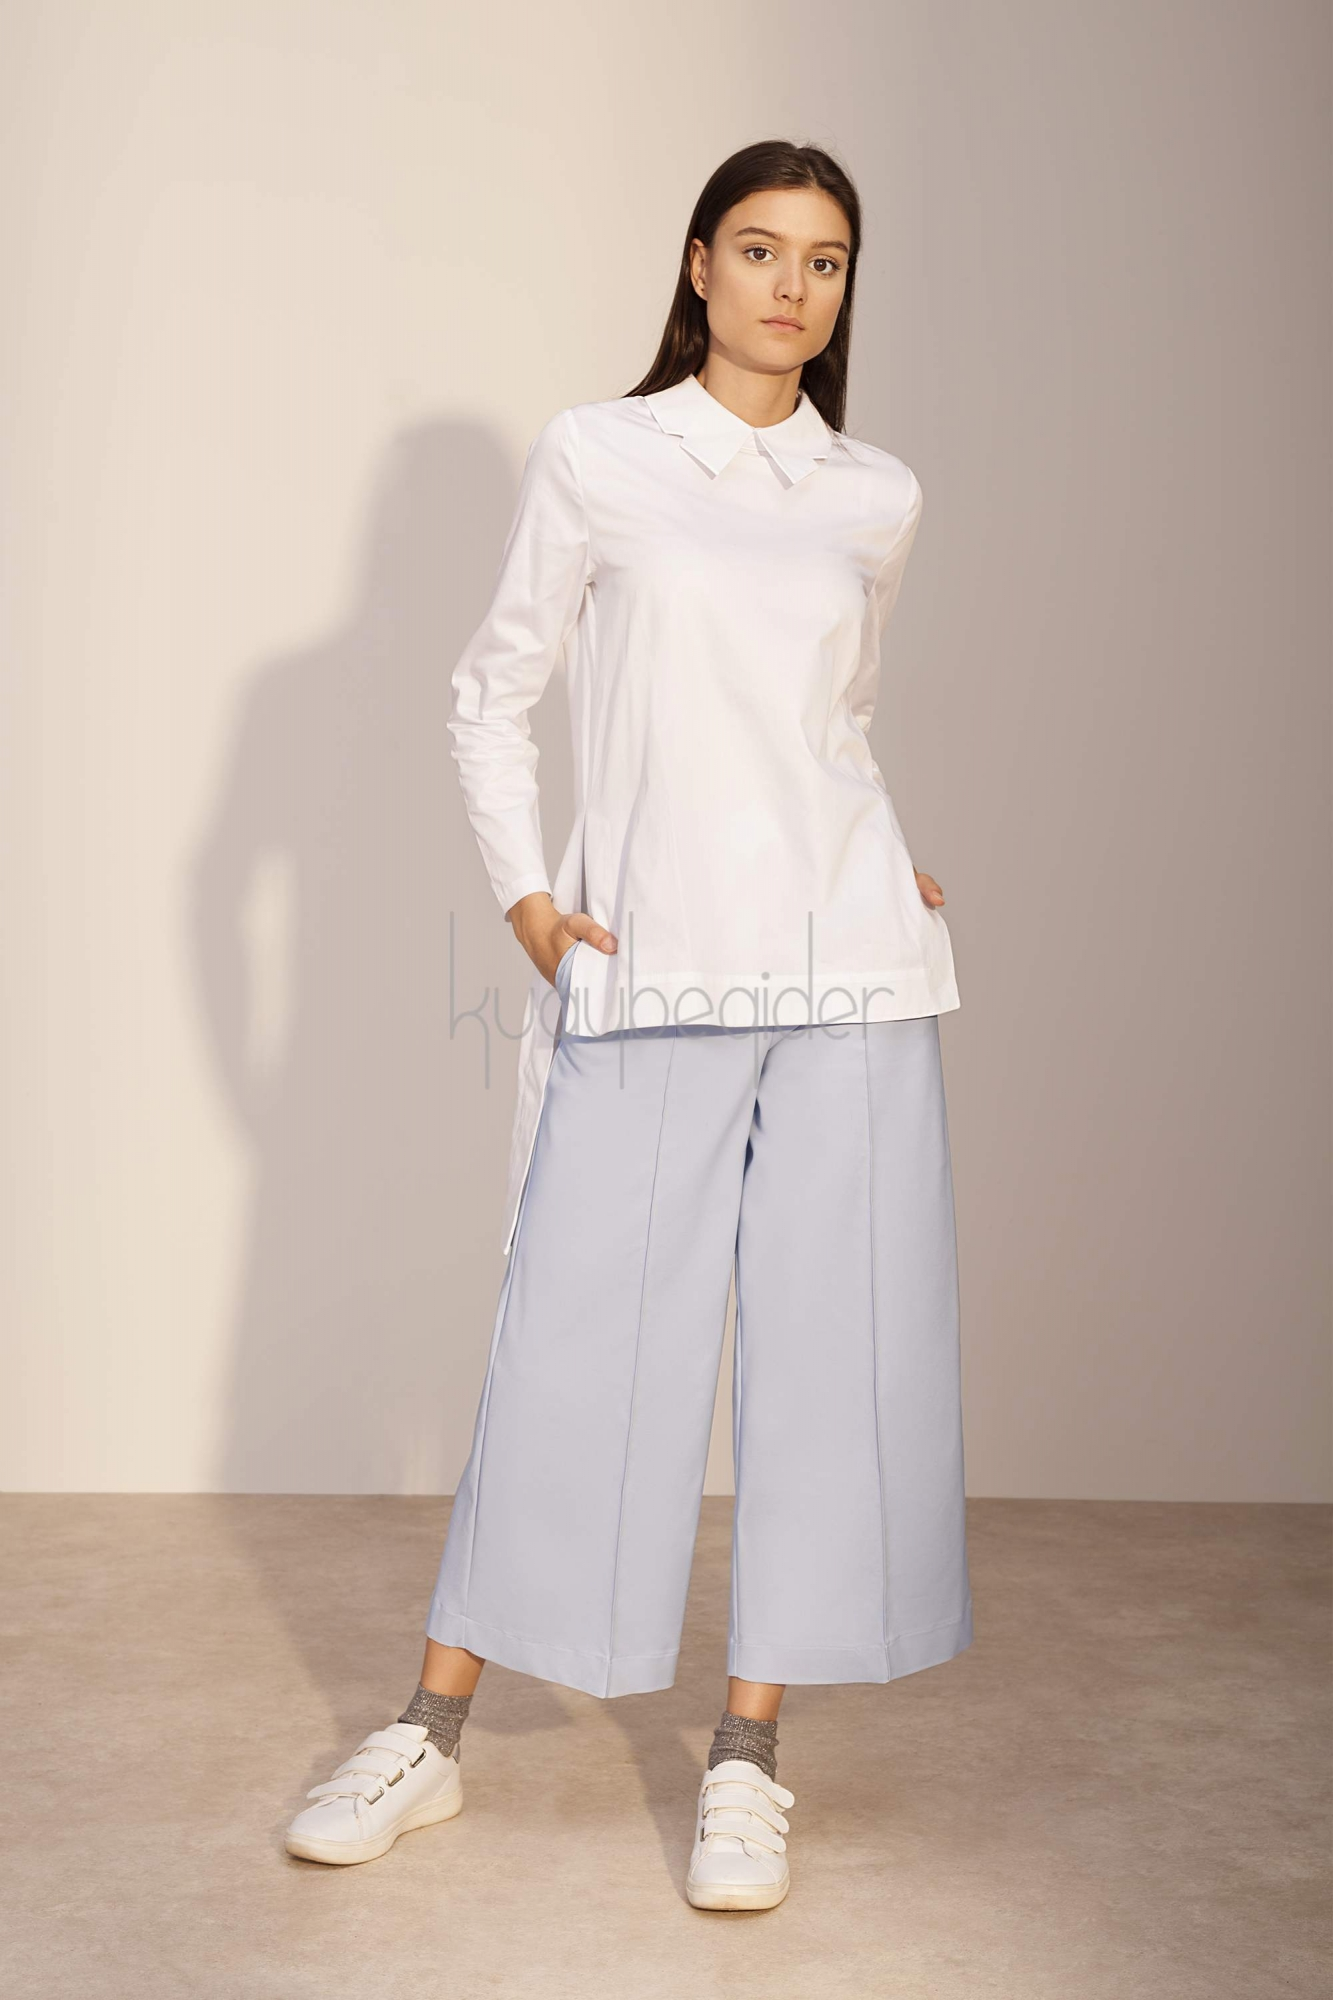 Kuaybe Gider - Mavi Sole Pantolon